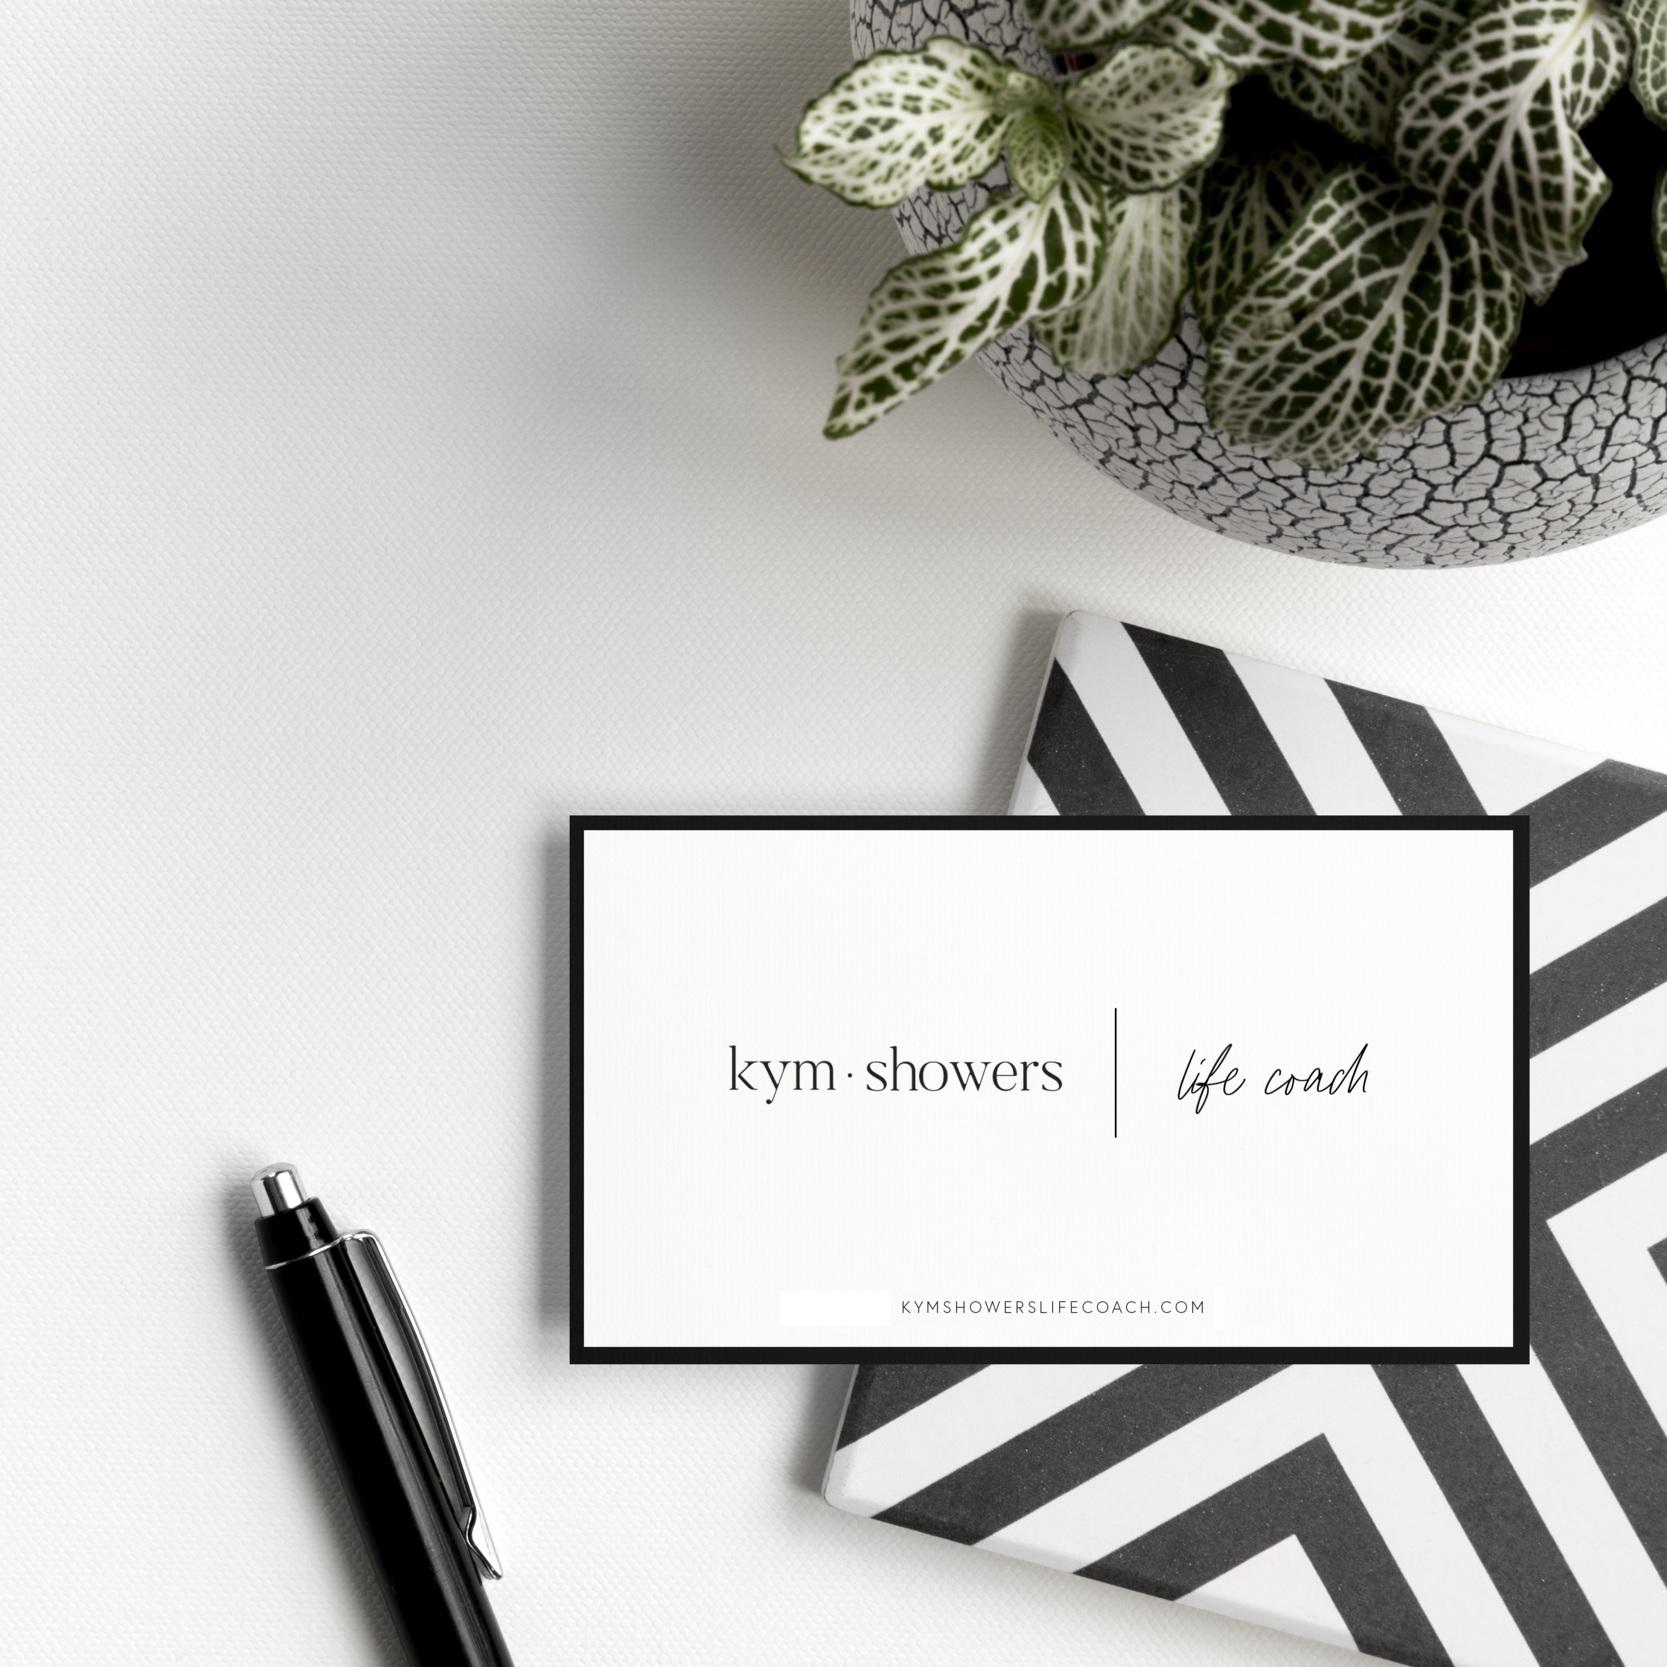 KymSHowers_CardMockup.png